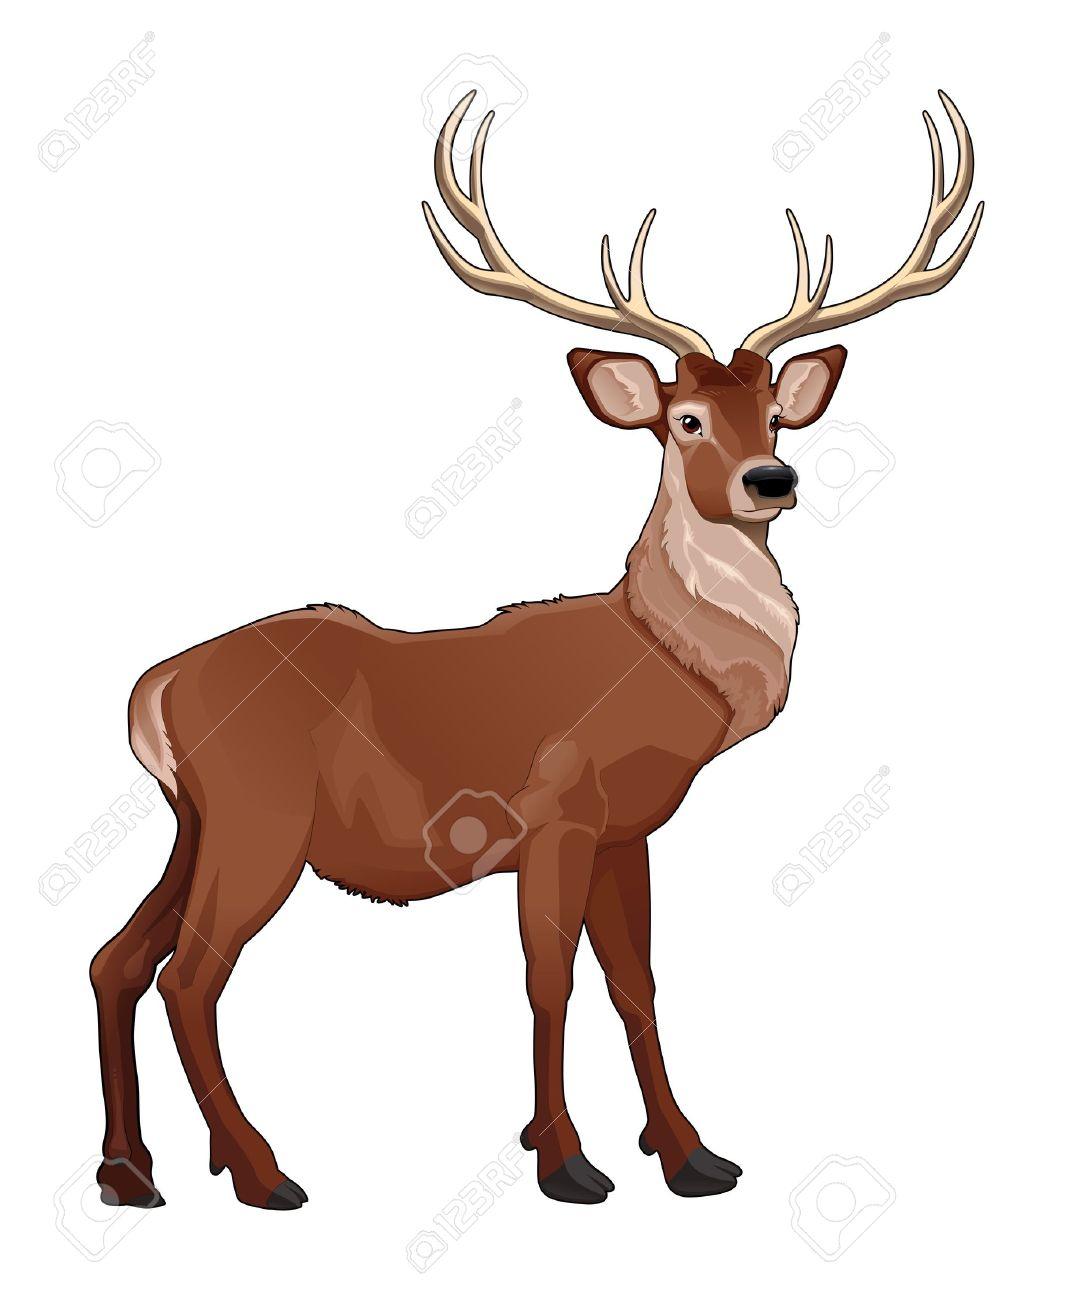 Elegant deer. Vector isolated animal. Stock Vector - 17542404